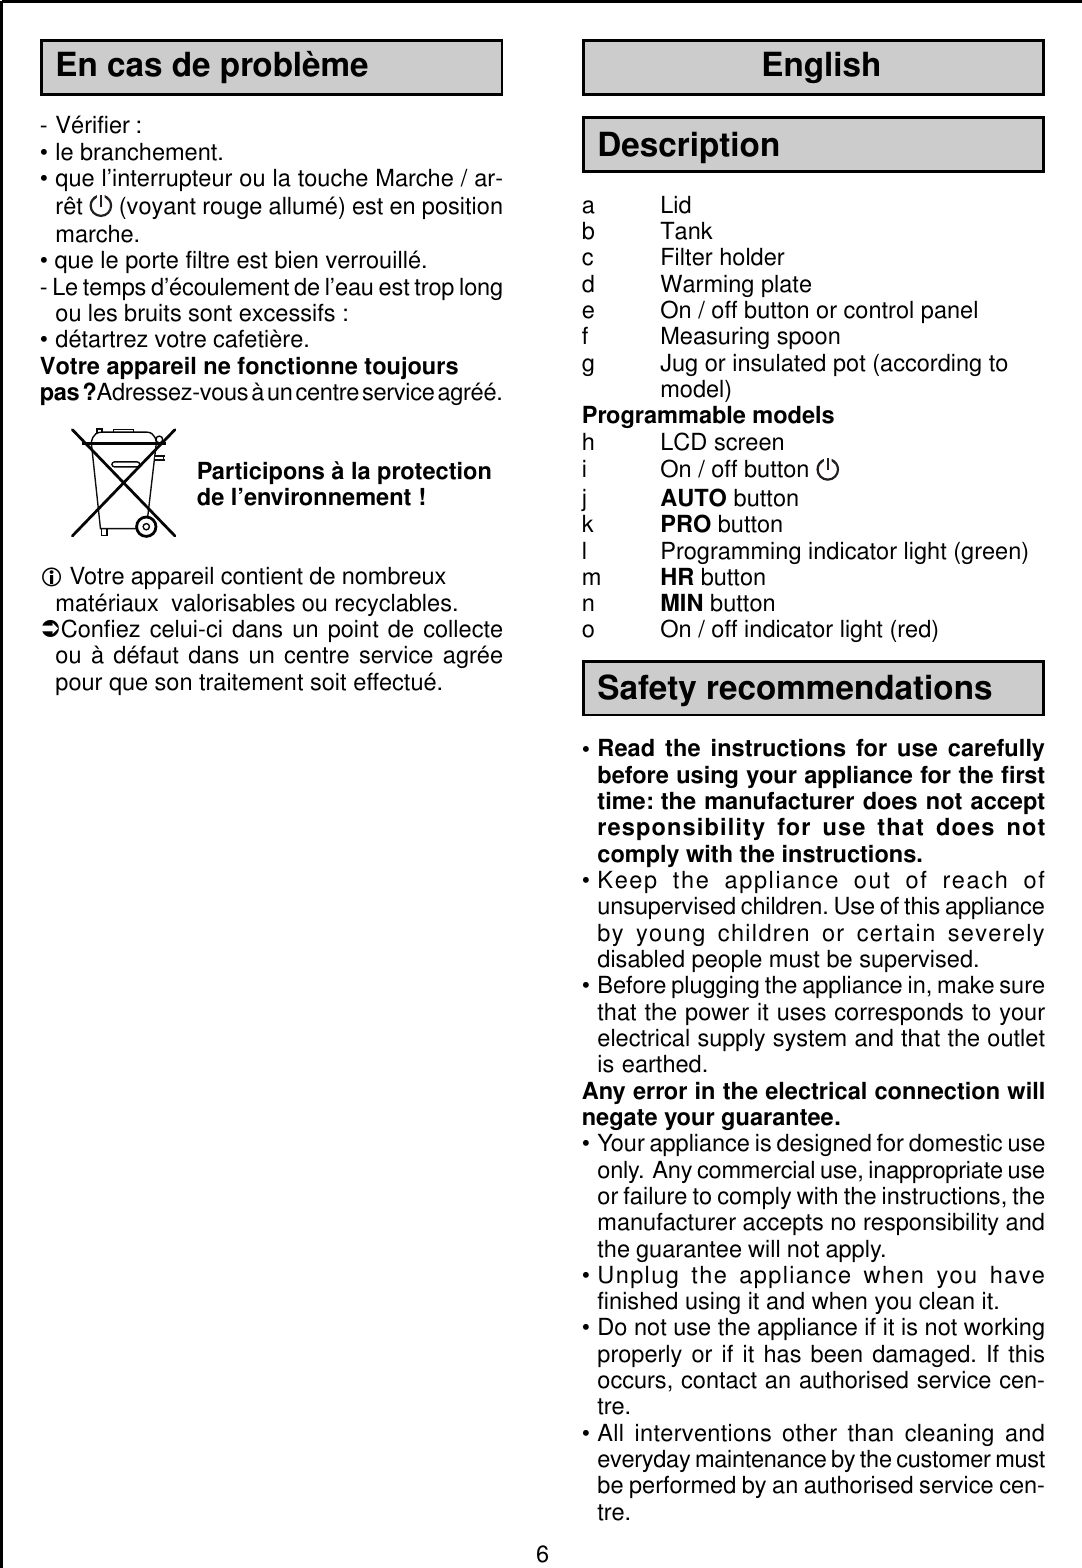 Moulinex Subito Instruction Manual Manualslib Makes It Easy